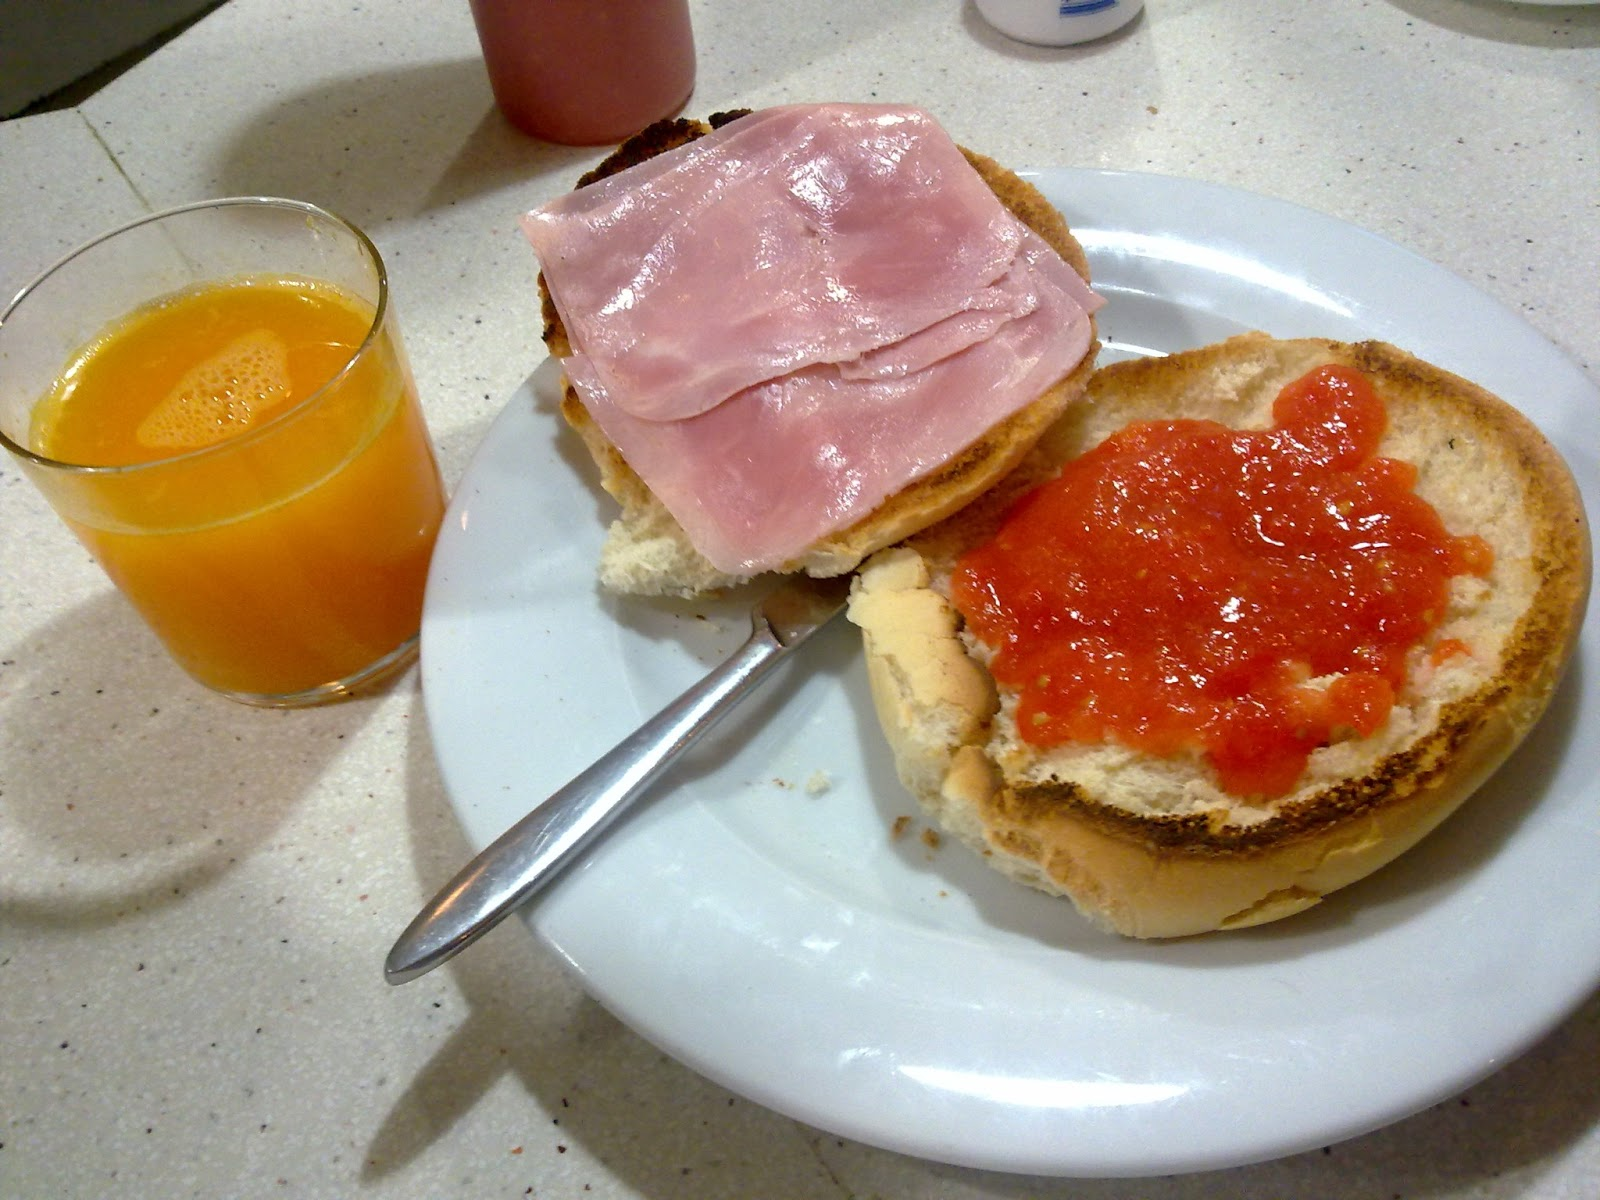 Foro colungateam - Desayunos en casa ...